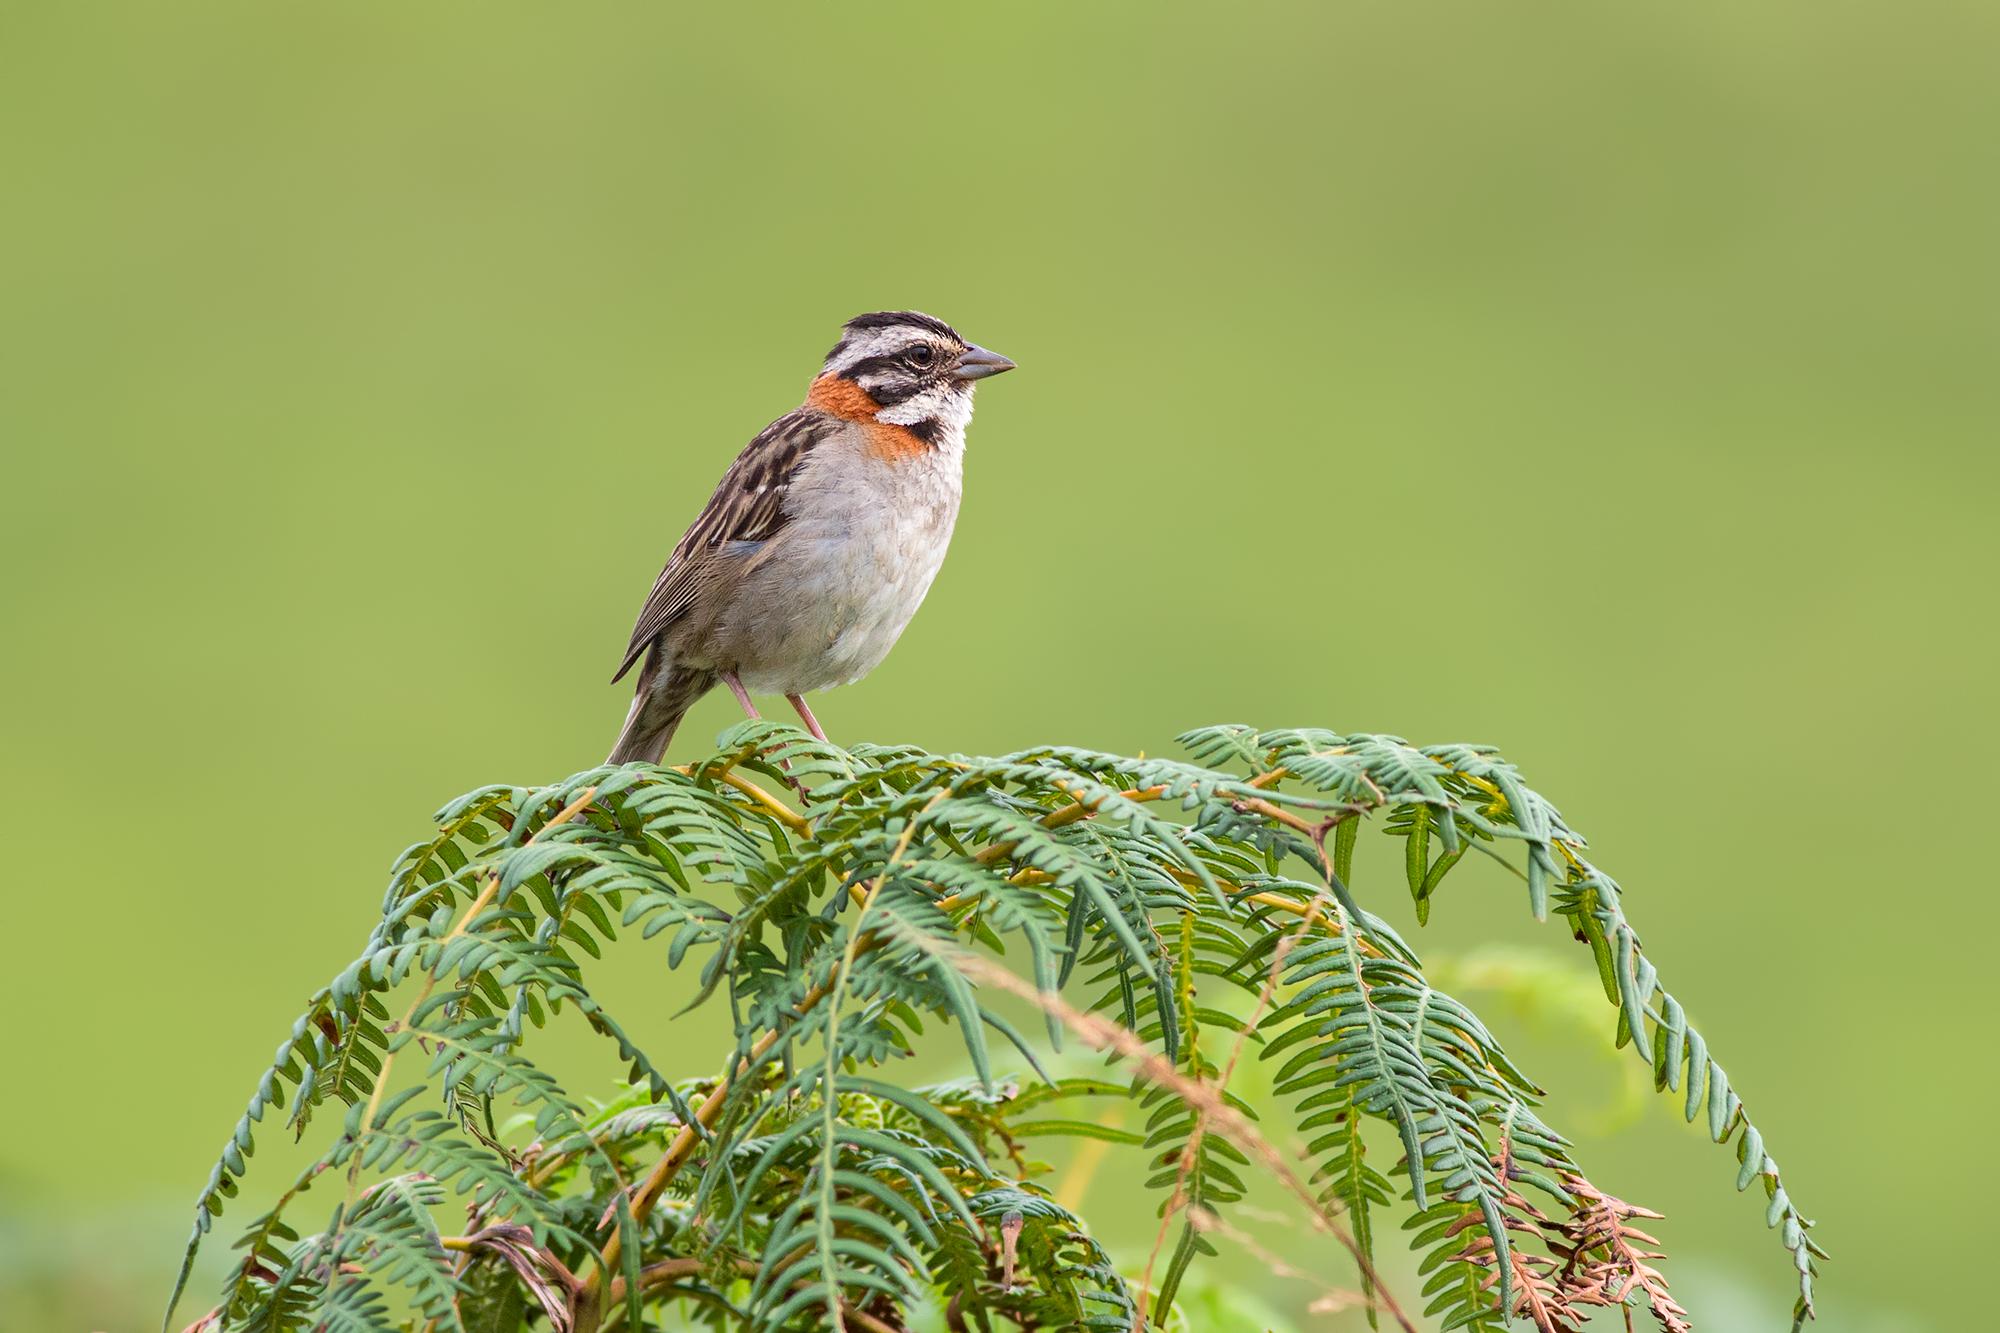 Rufous-collared-Sparrow-JPEG_web 2.jpg